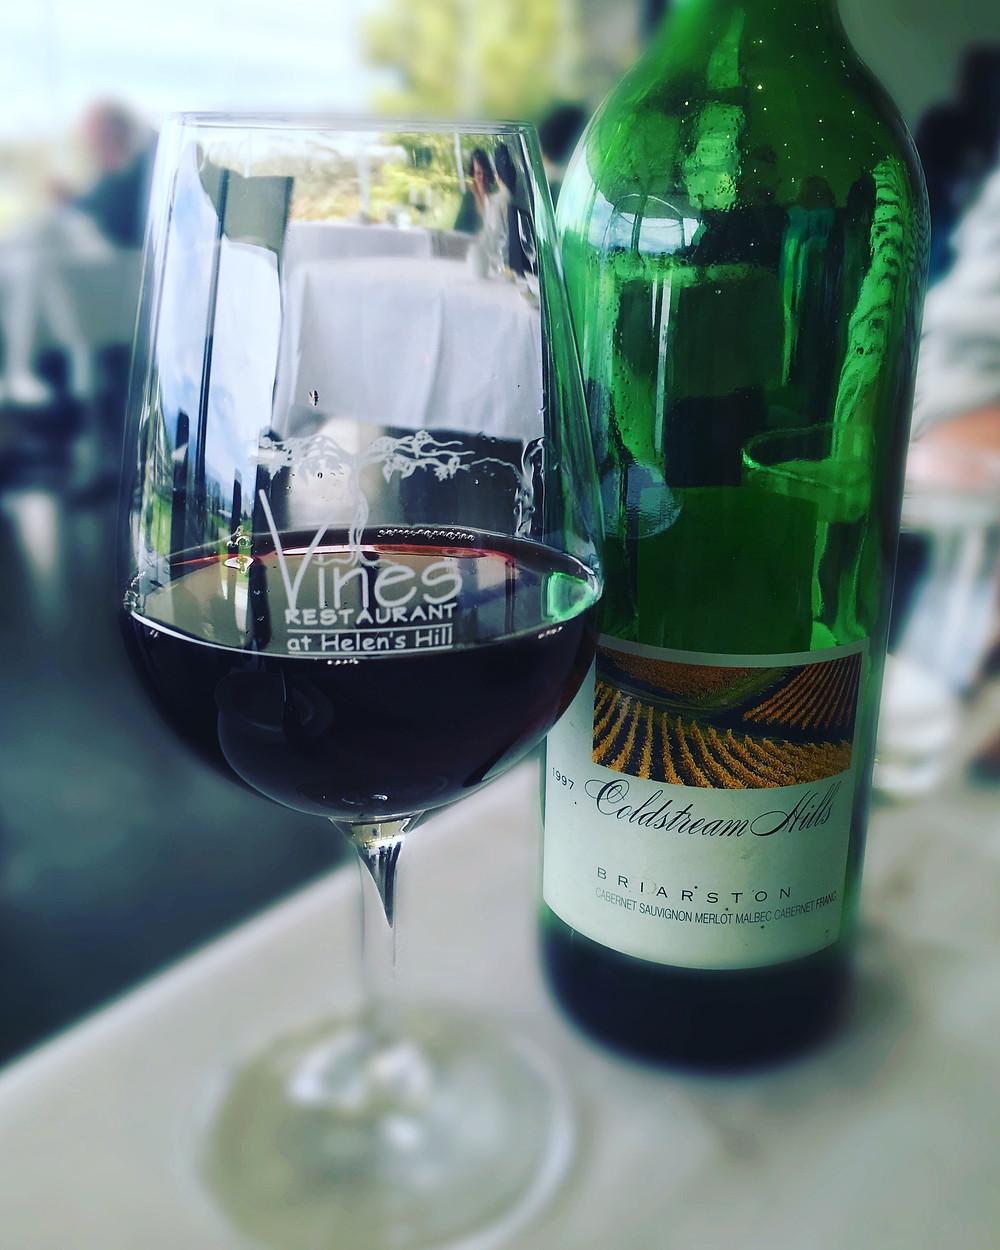 Vines Restaurant | Coldstream Hills 1997 Bordeaux blendx